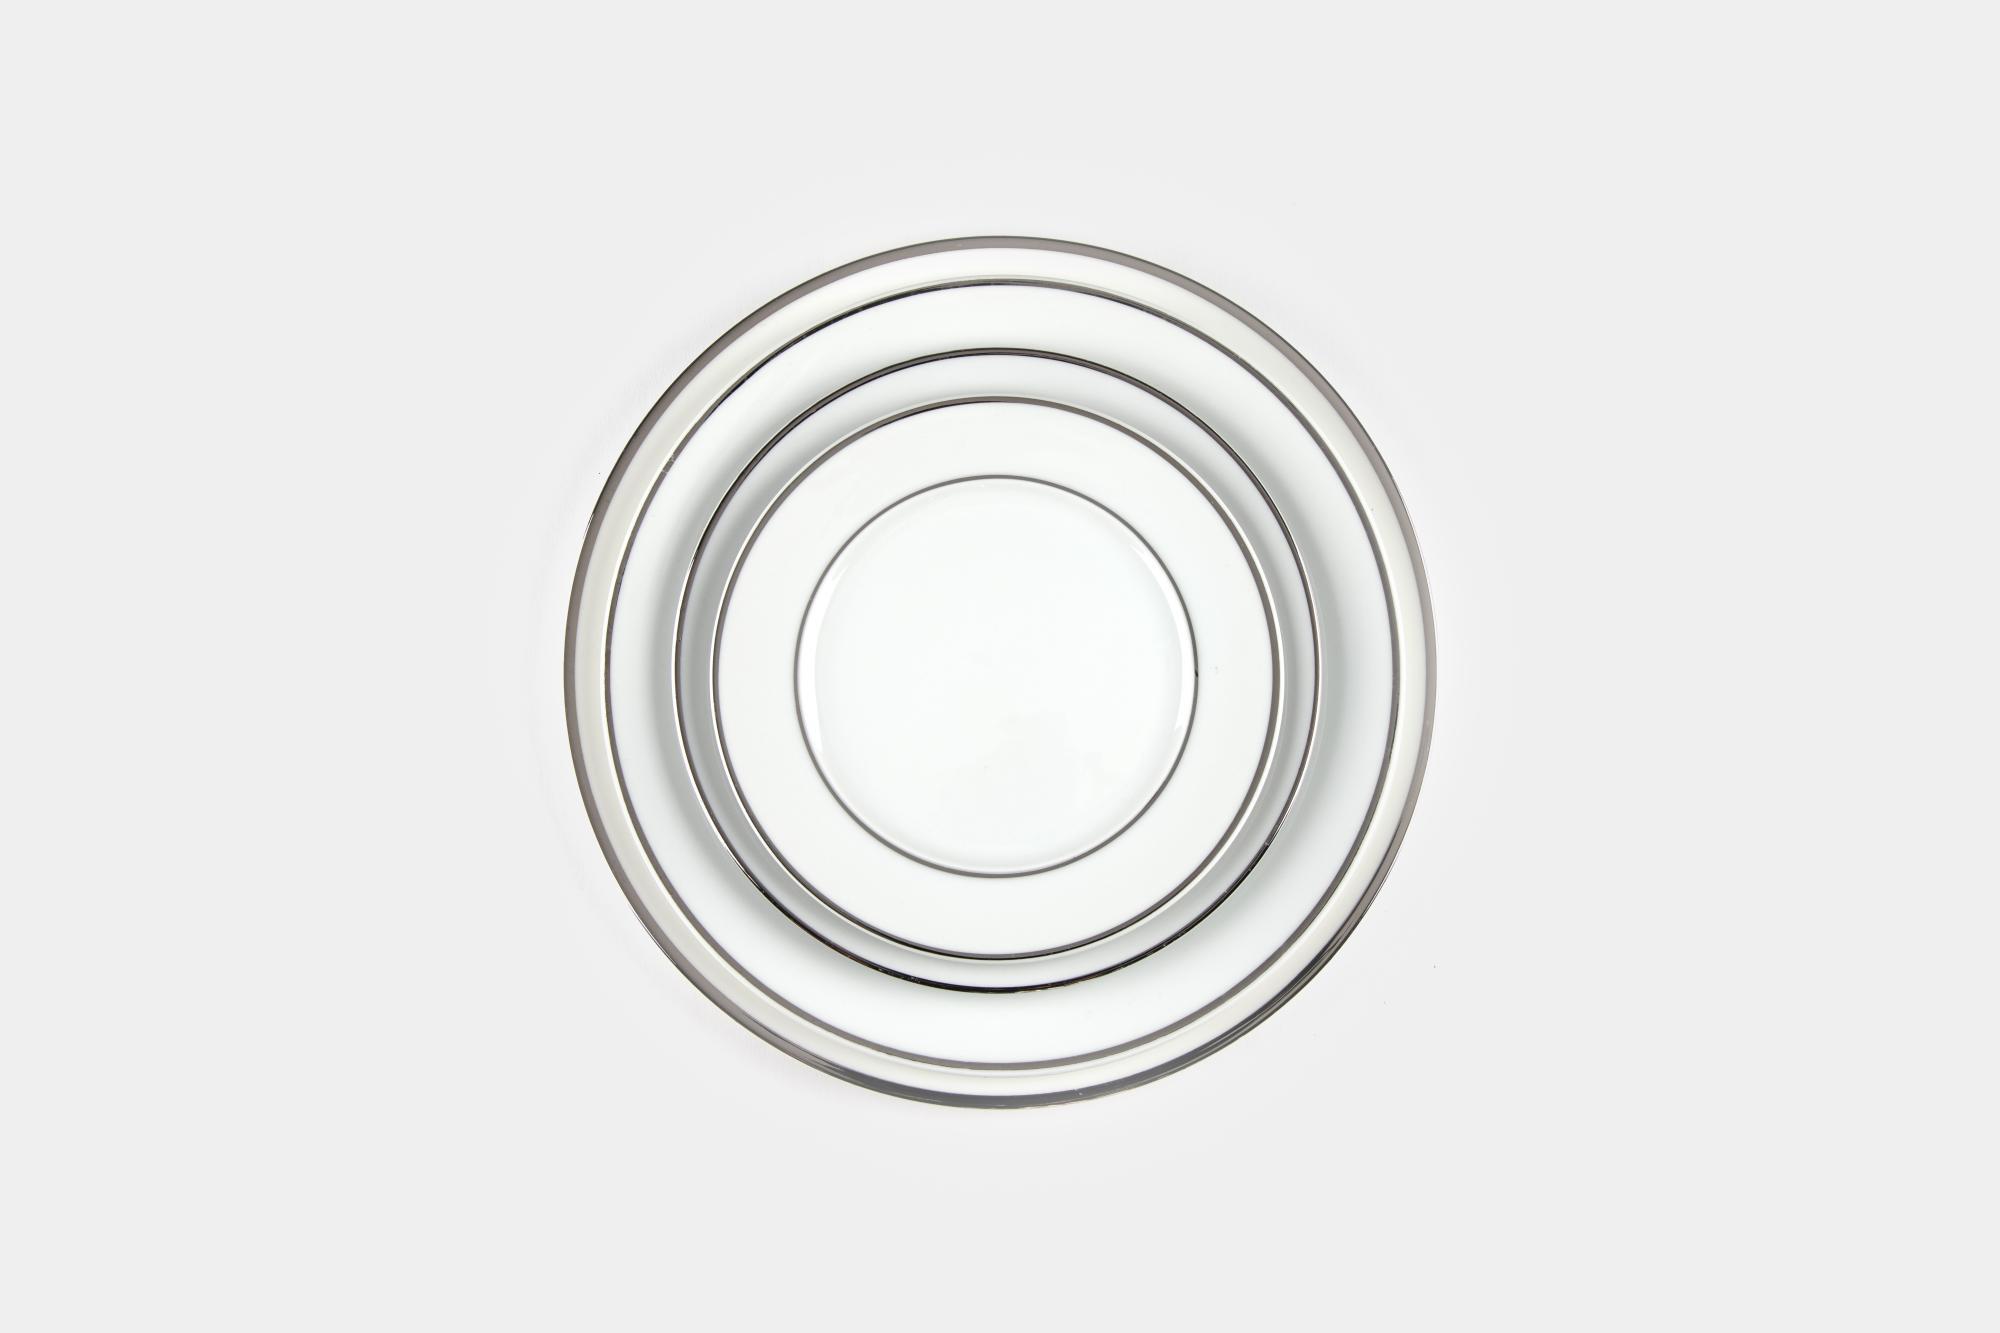 Ionia plate set - Image 1